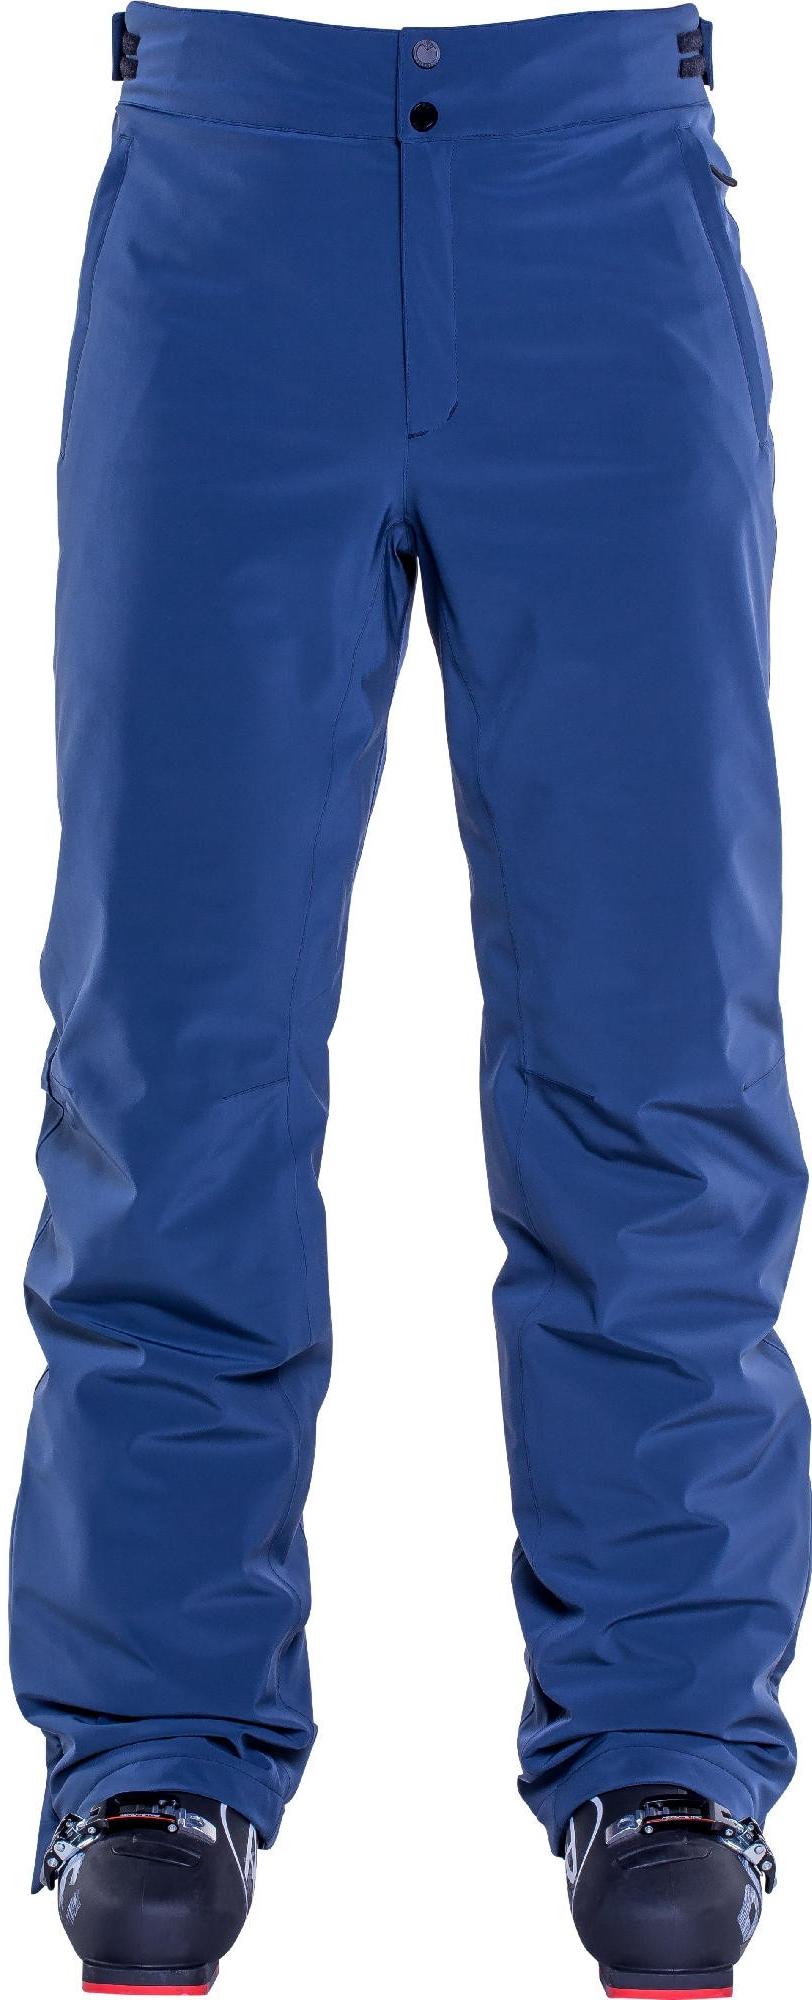 Rossignol Gravity Pants, $650